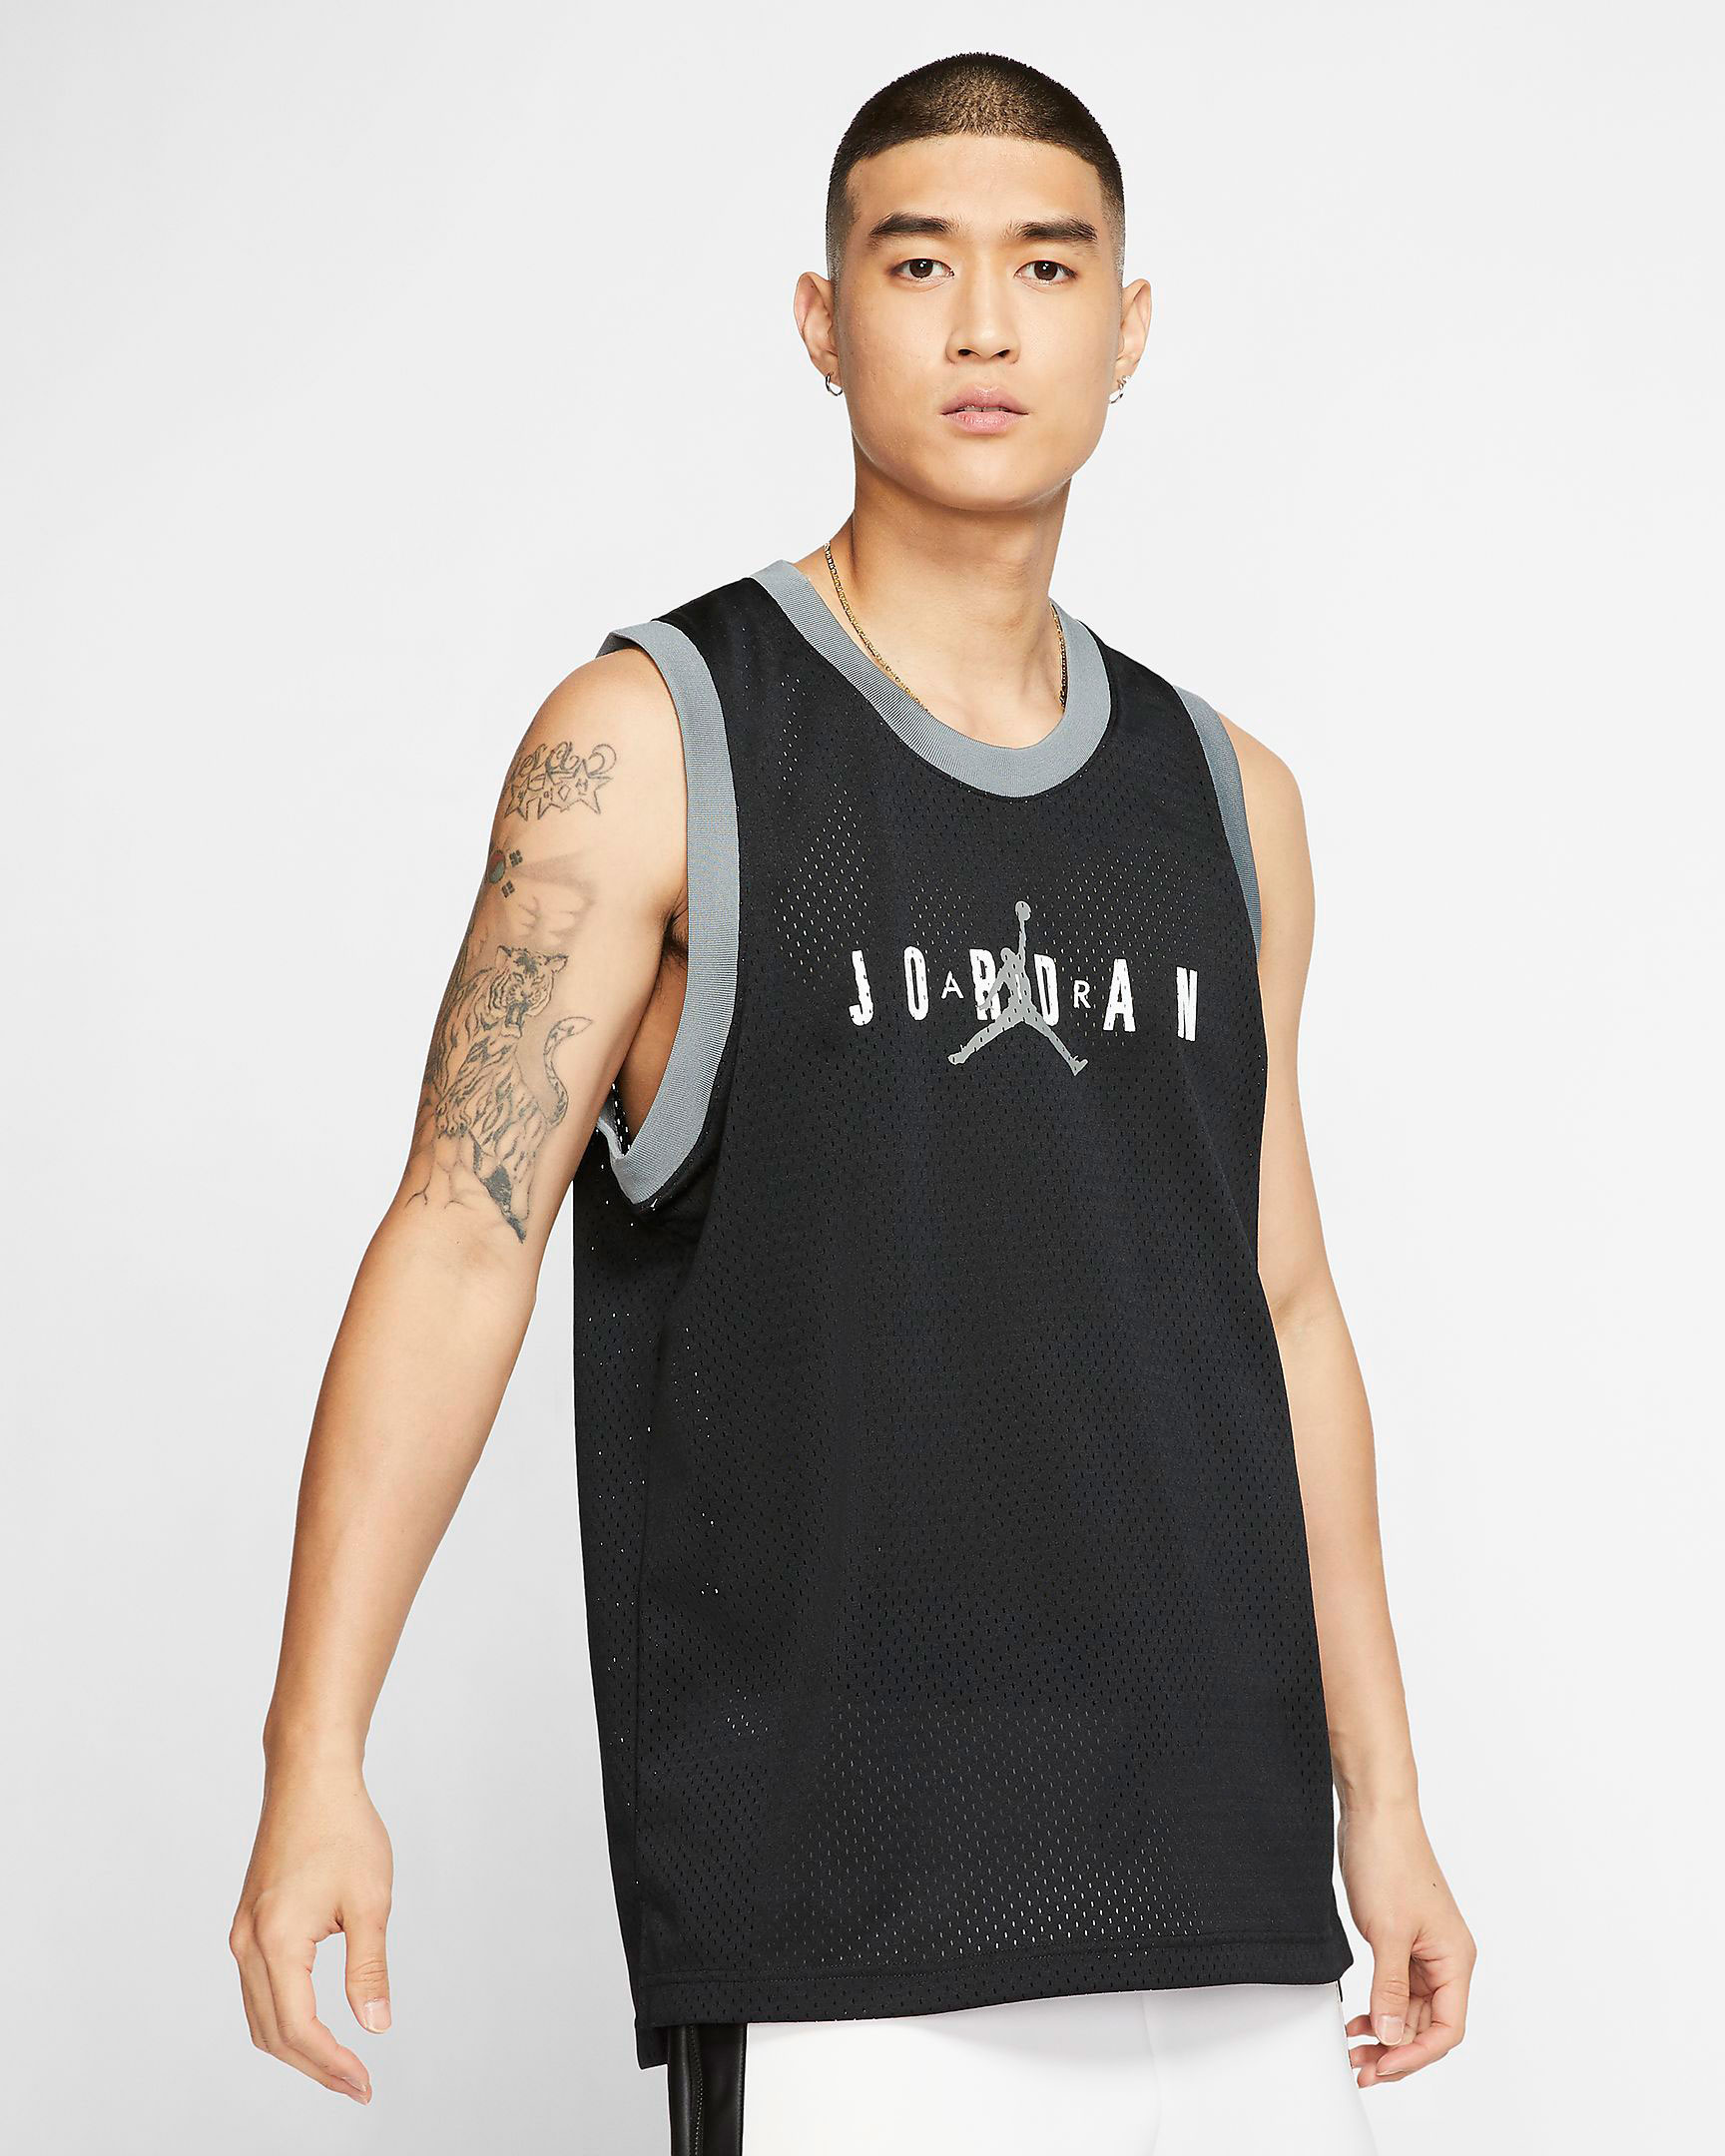 jordan-sport-dna-jersey-black-grey